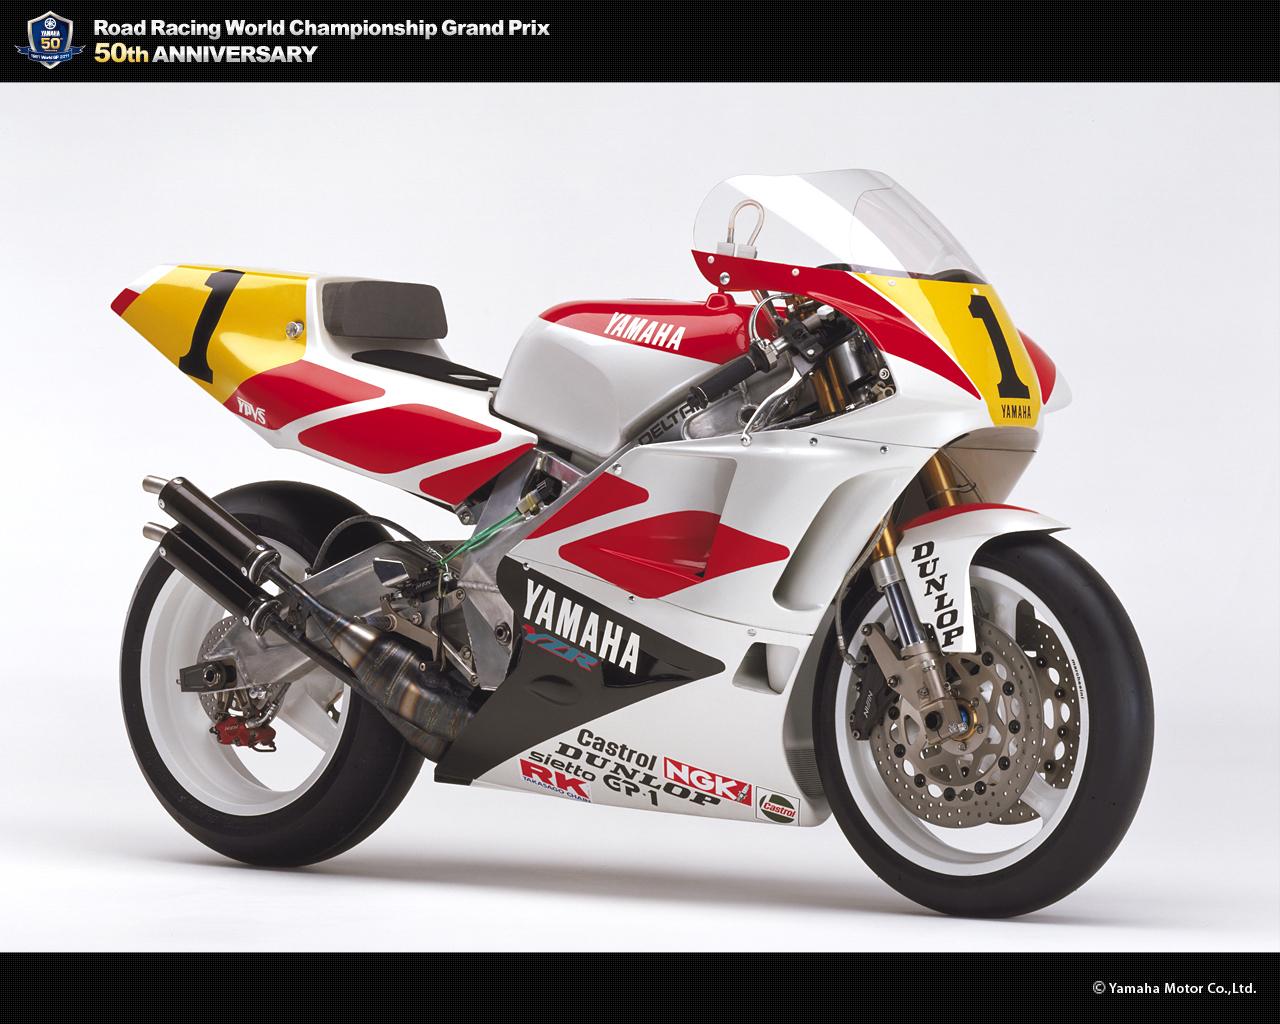 Yzr500 0wc1 race yamaha motor co ltd